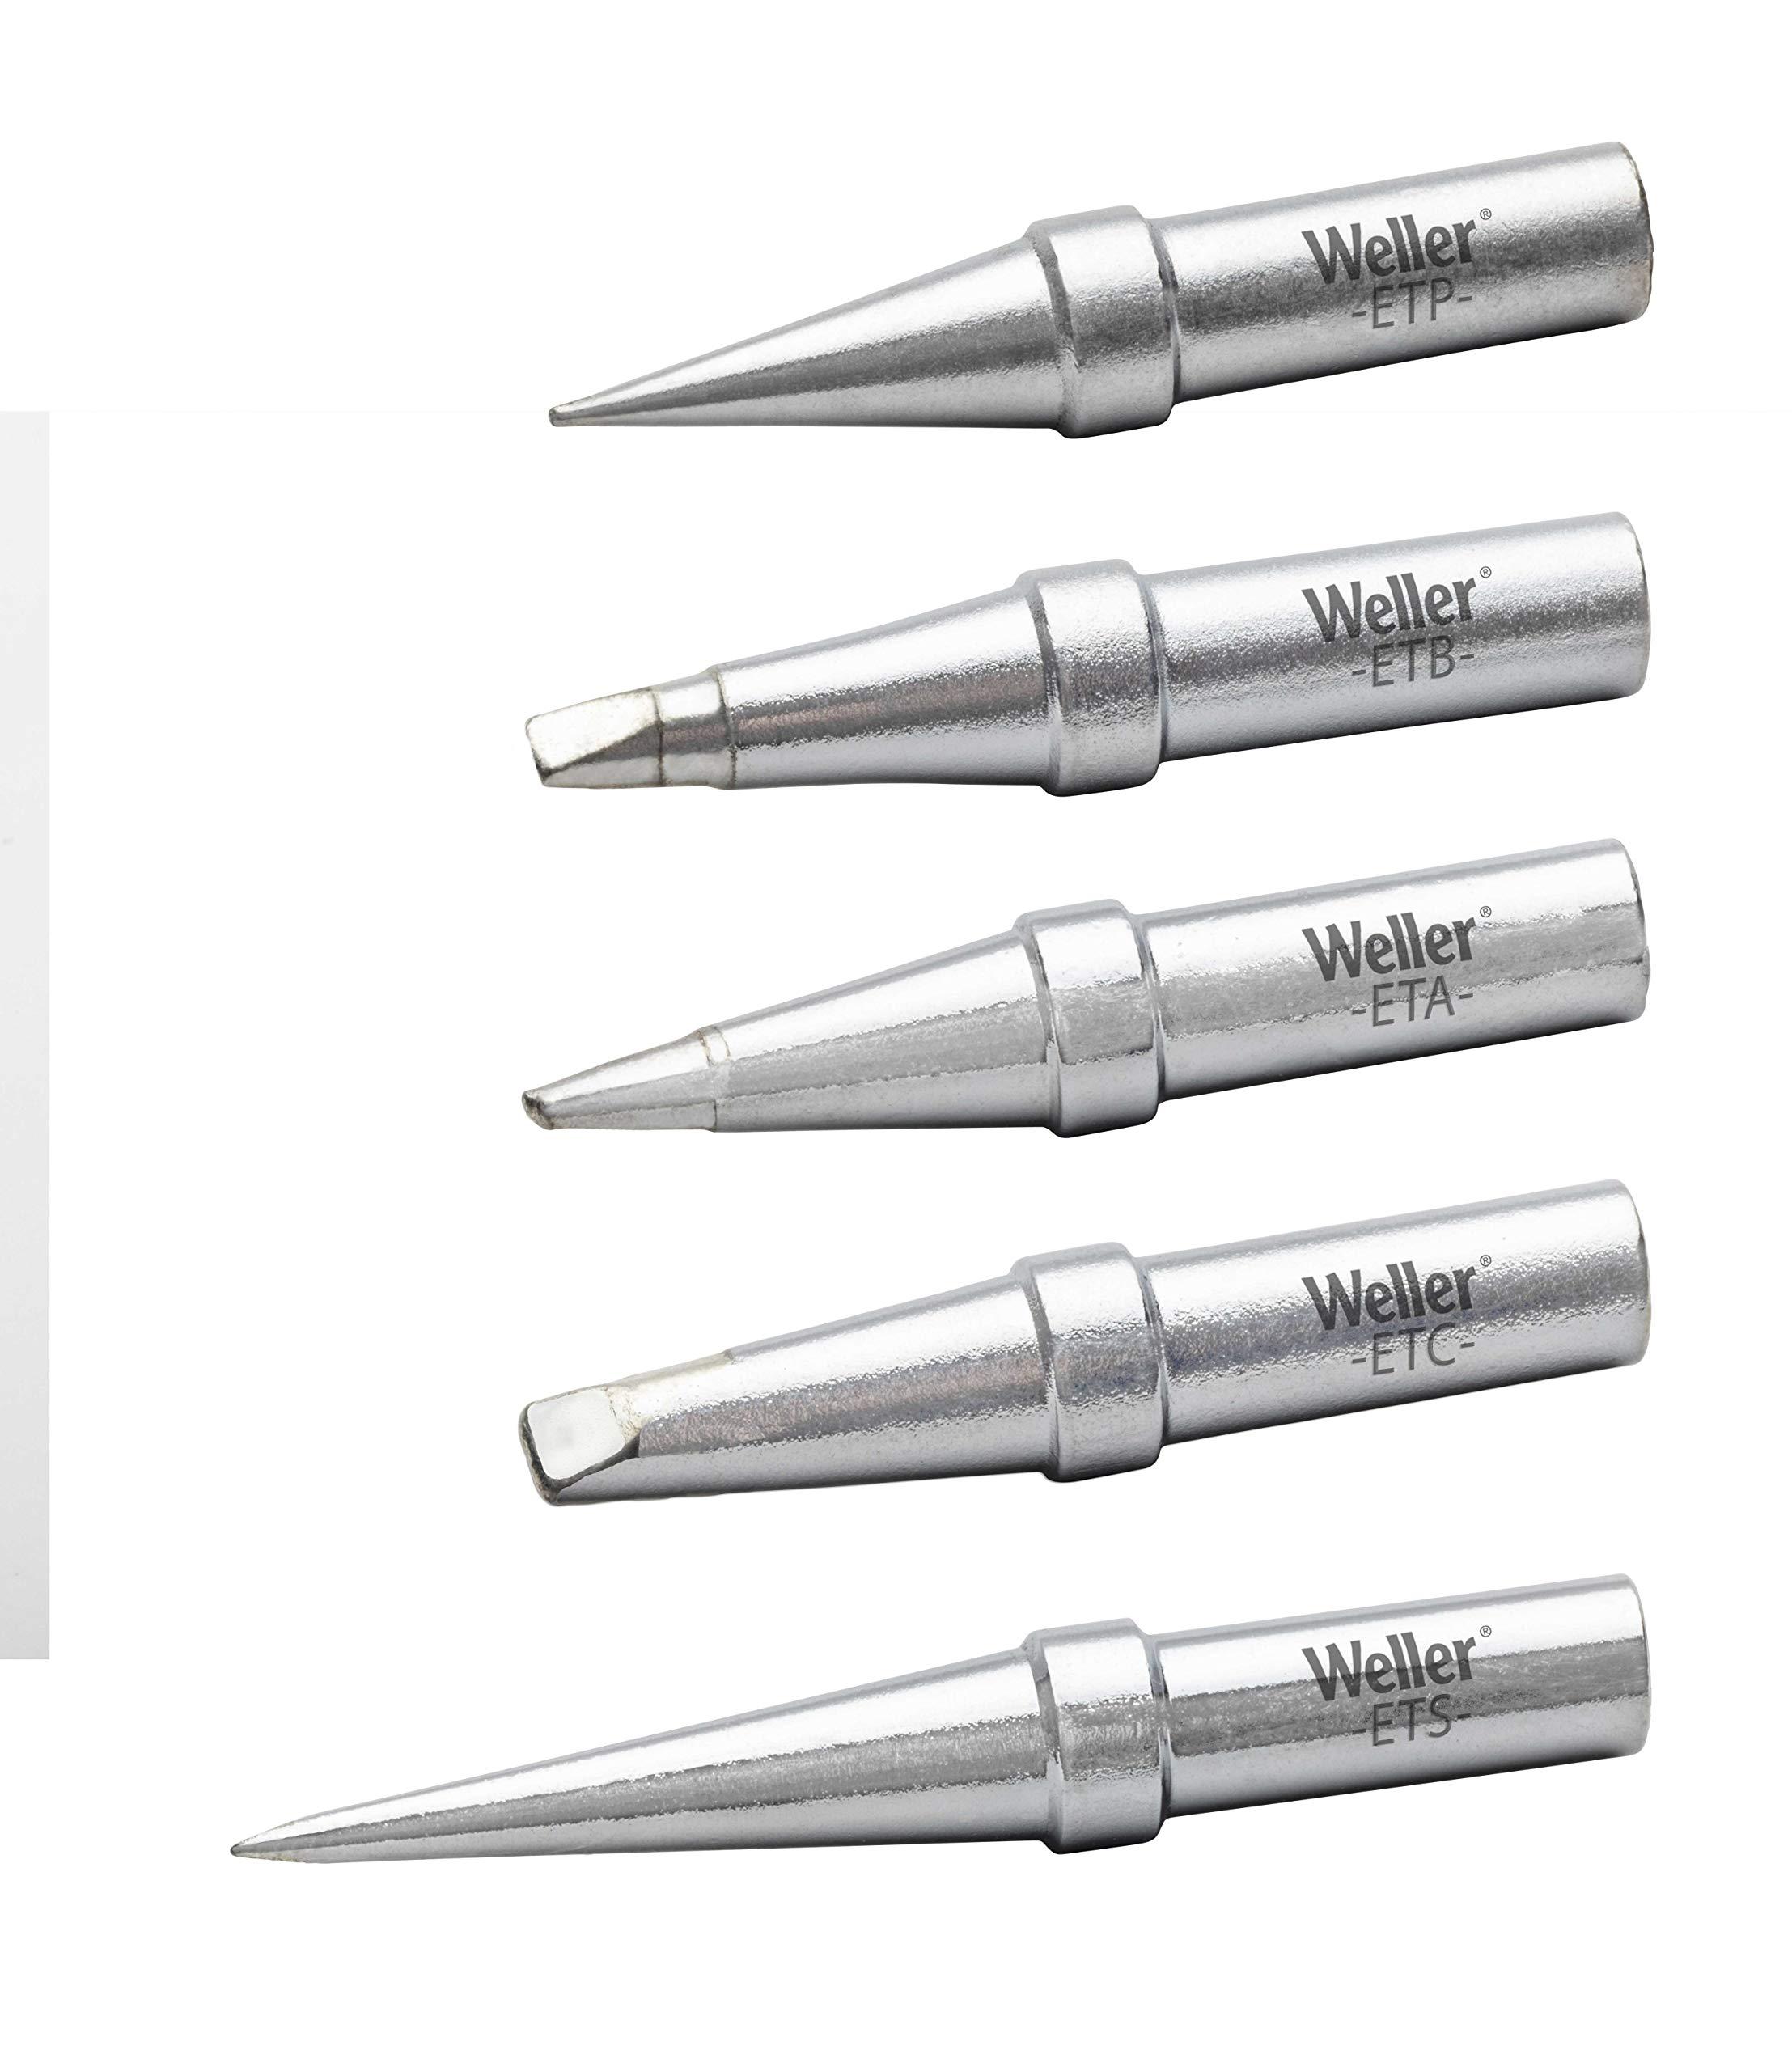 Genuine Weller WE1010 Soldering Tip Set - ETA, ETB, ETC, ETP, TETS, 5 PCS